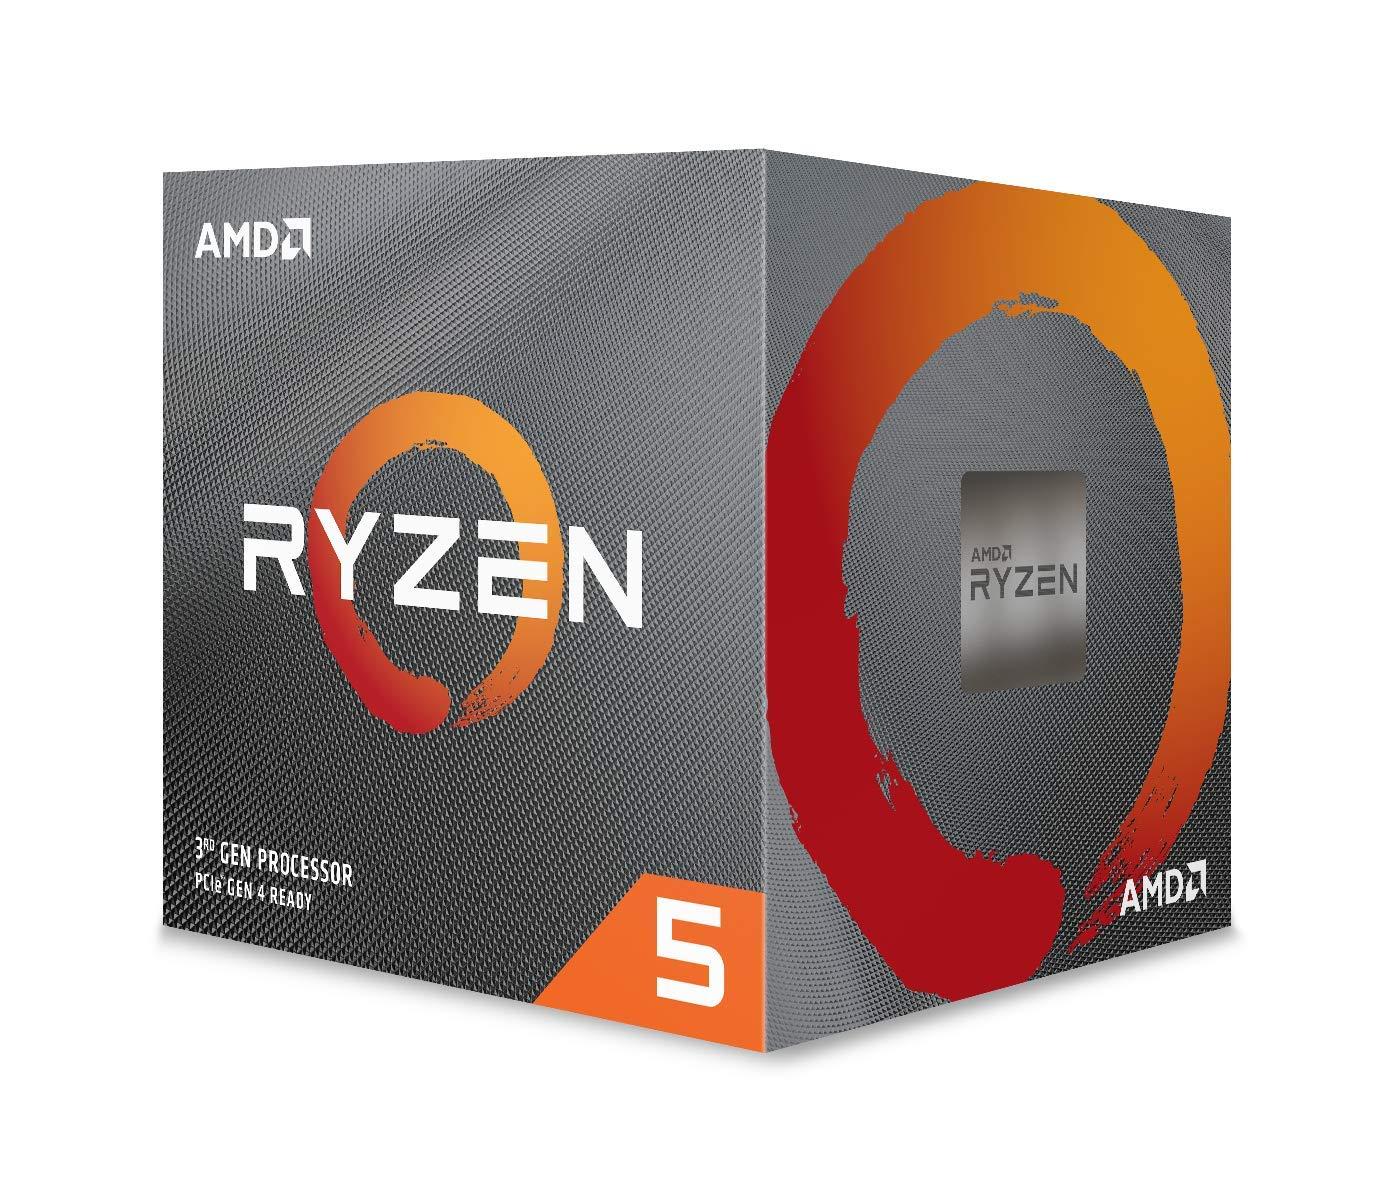 12-thread processor with Wraith Spire Cooler AMD Ryzen 5 3600X 6-core